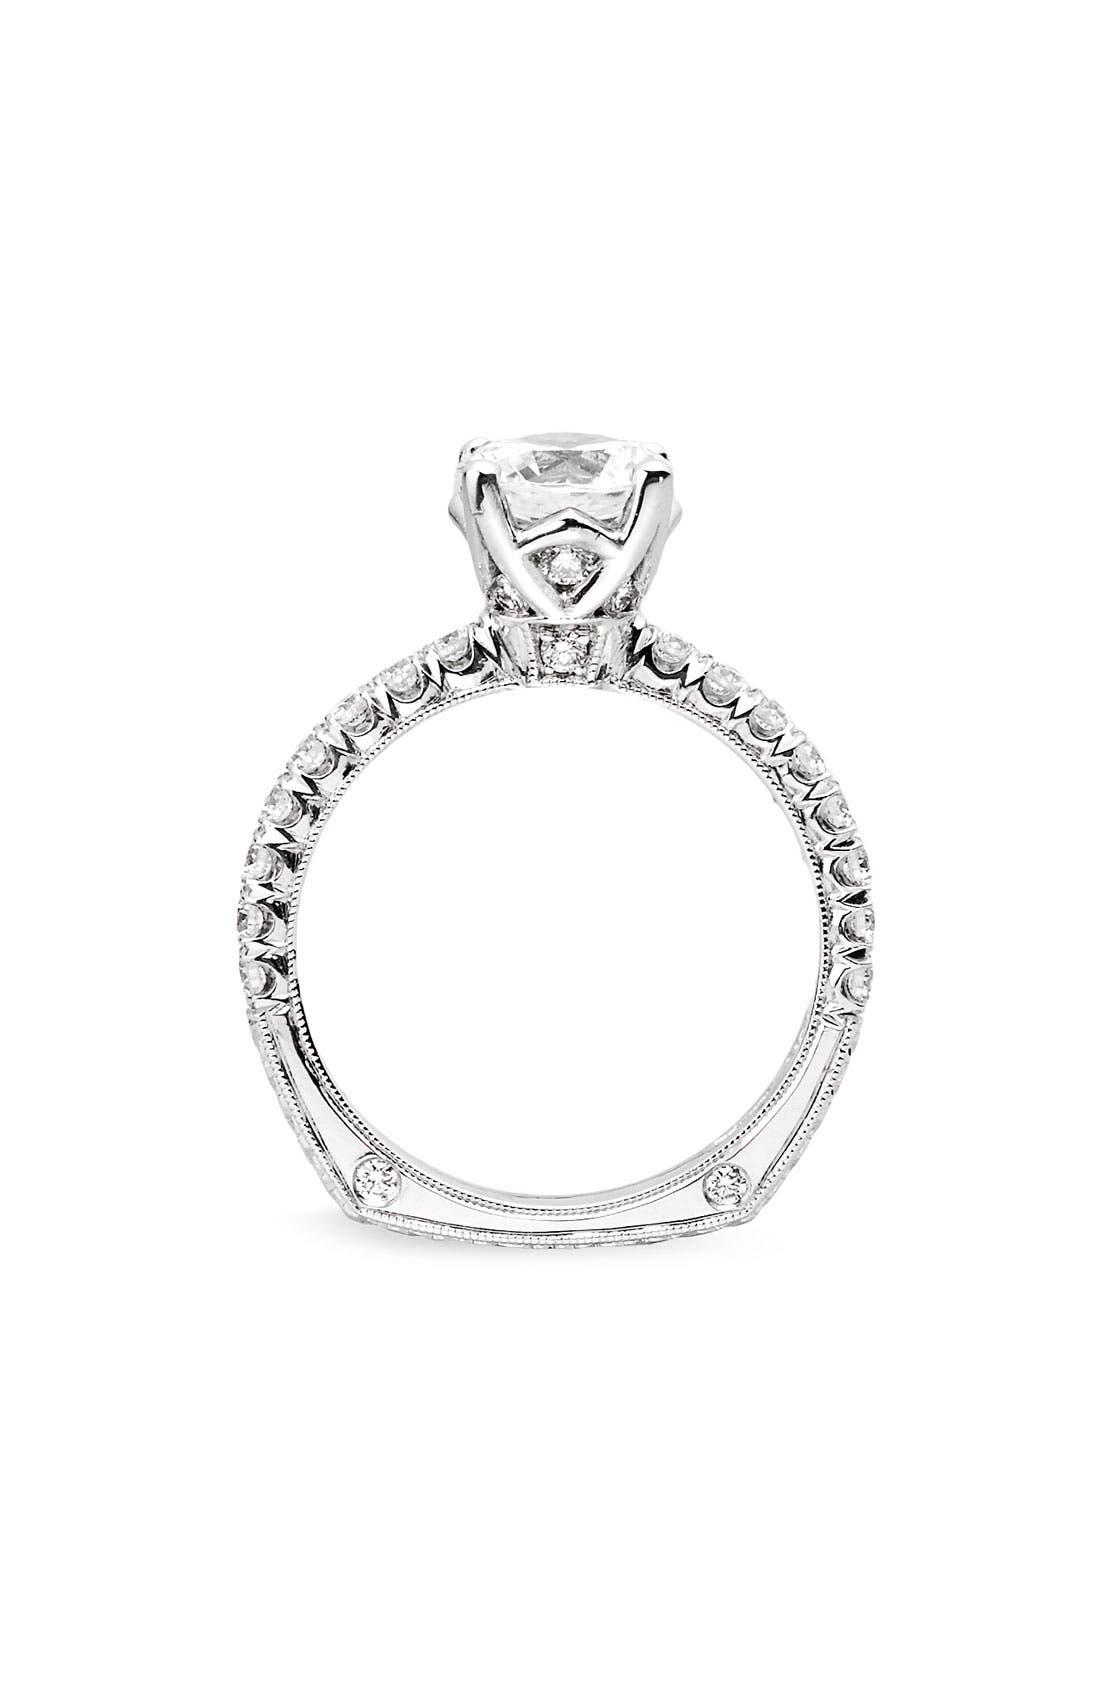 Alternate Image 2  - Jack Kelége 'Romance' Diamond Engagement Ring Setting